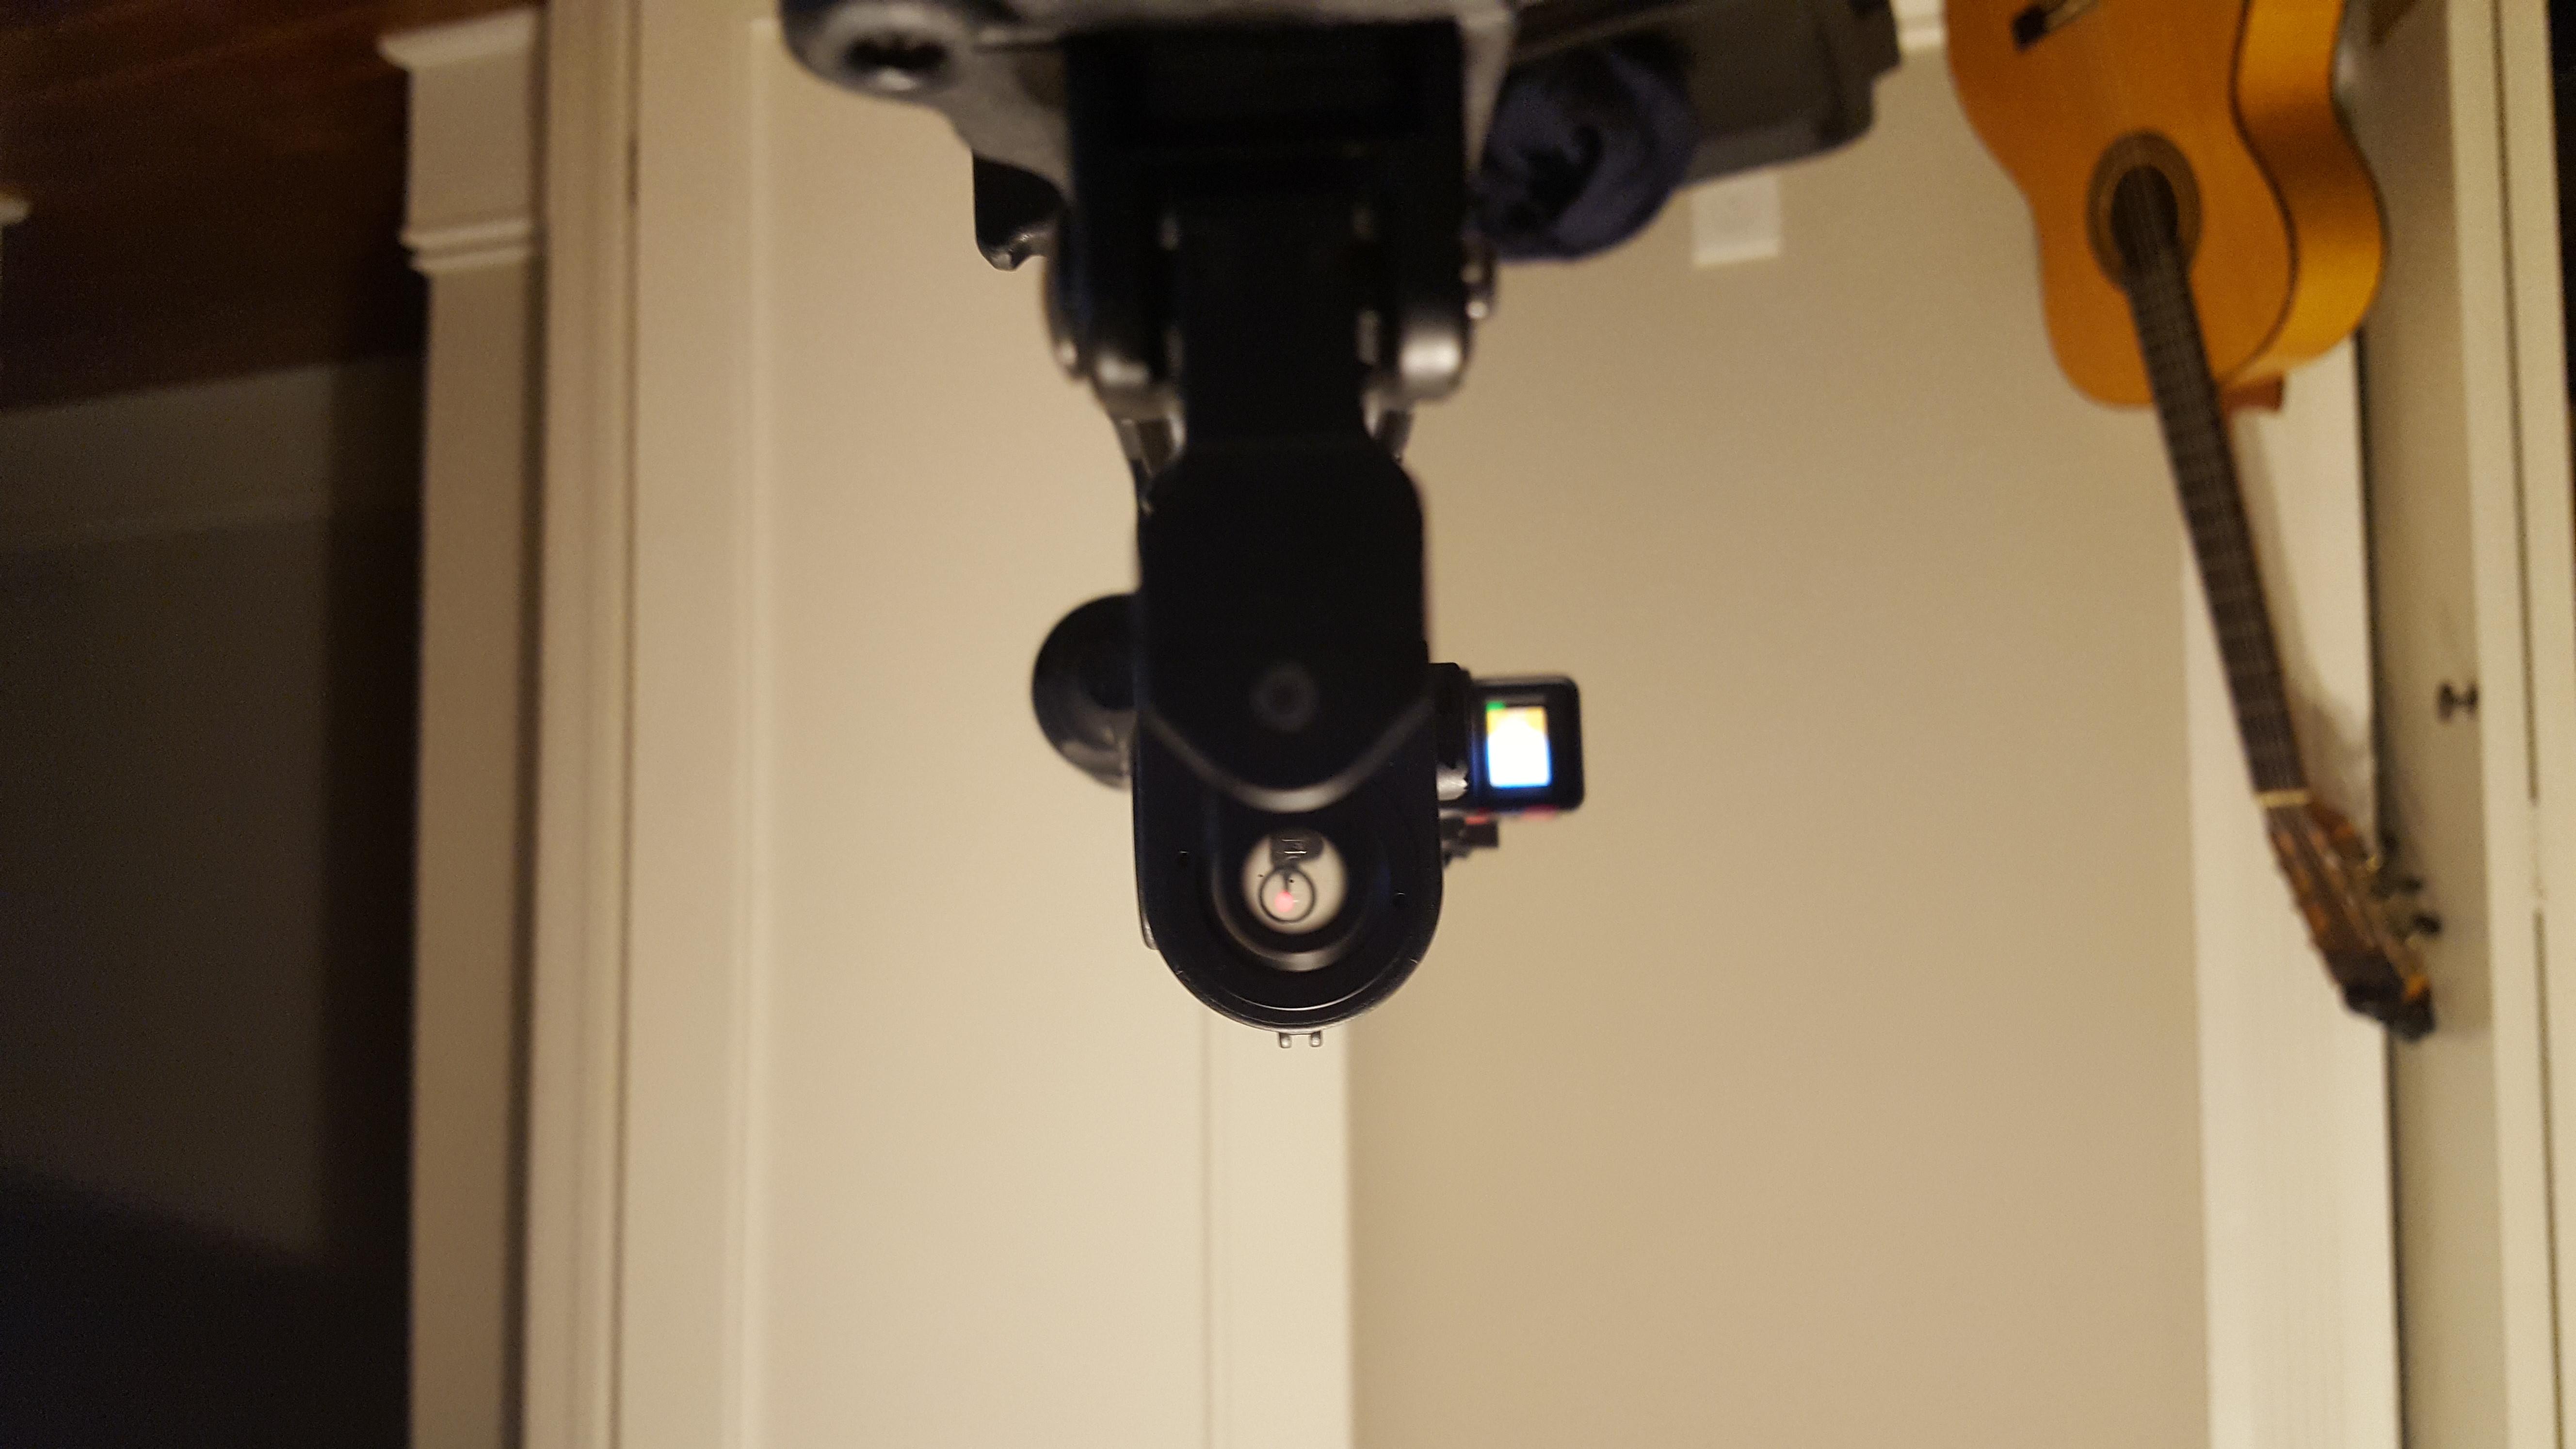 Torrey Pines Logic T12-V Thermal Imaging Sight - 0 (Free S/H over )-20191105_171644.jpg